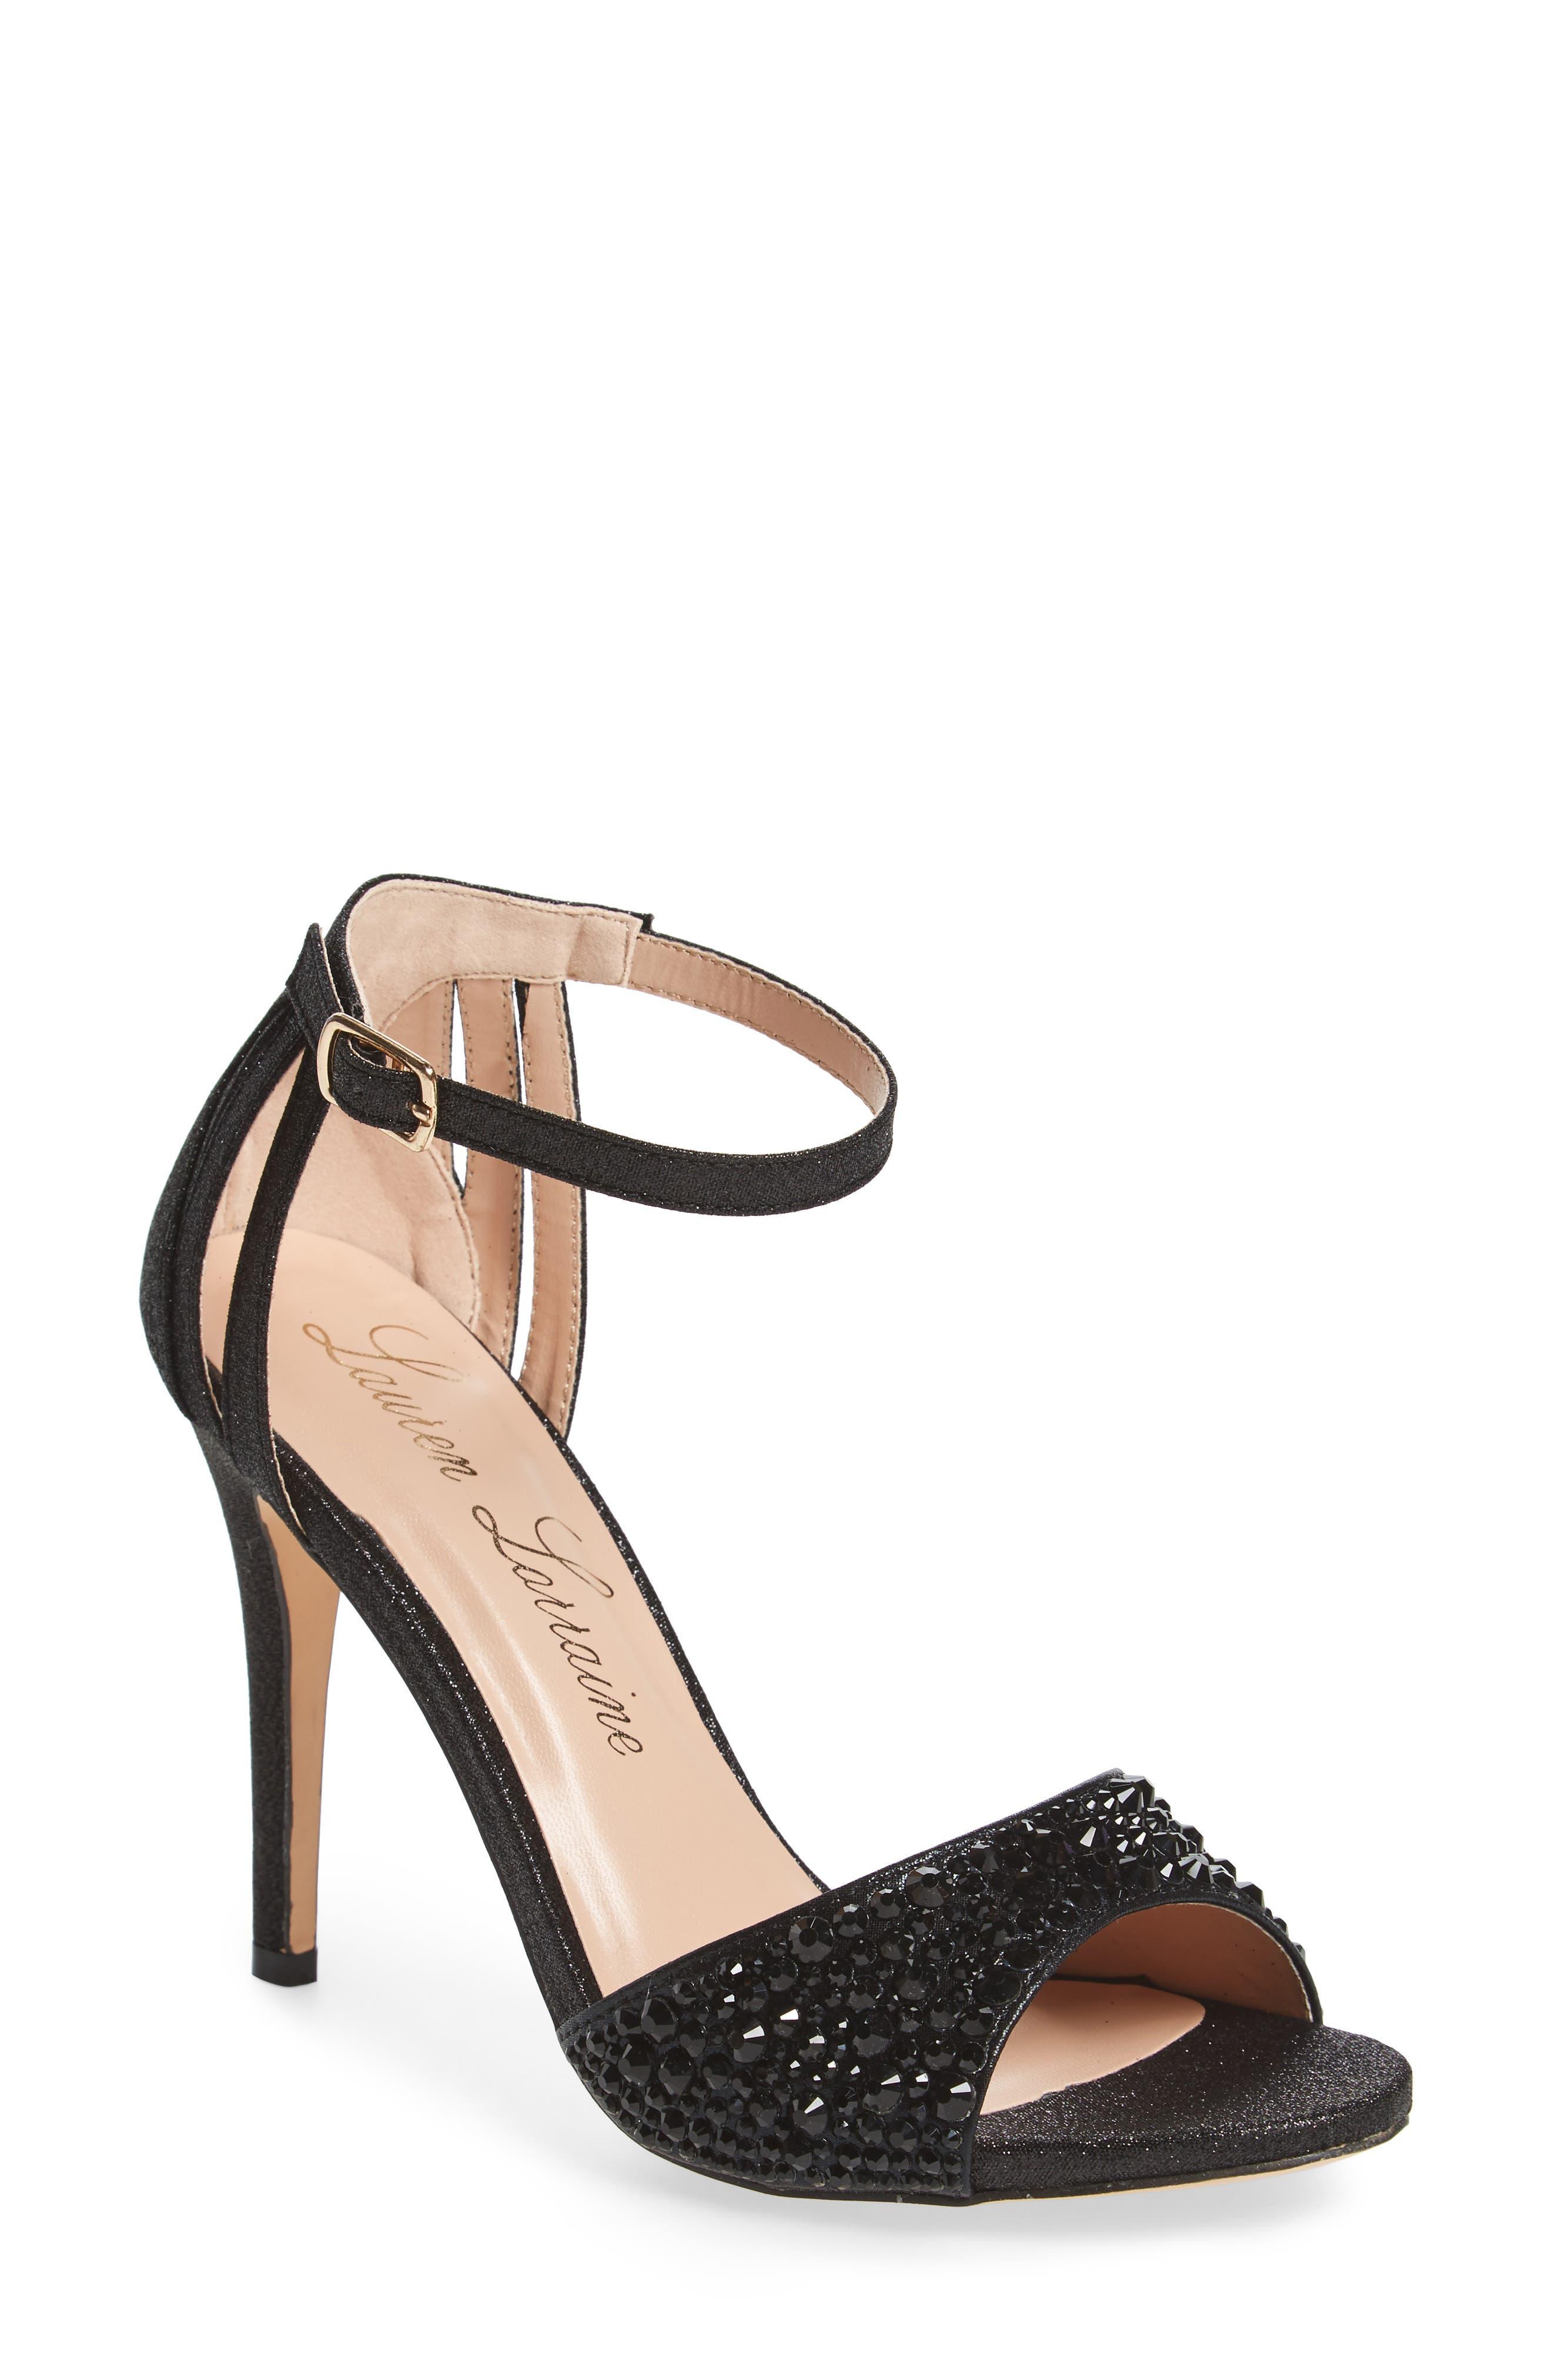 Maddy Embellished Sandal,                             Main thumbnail 1, color,                             001